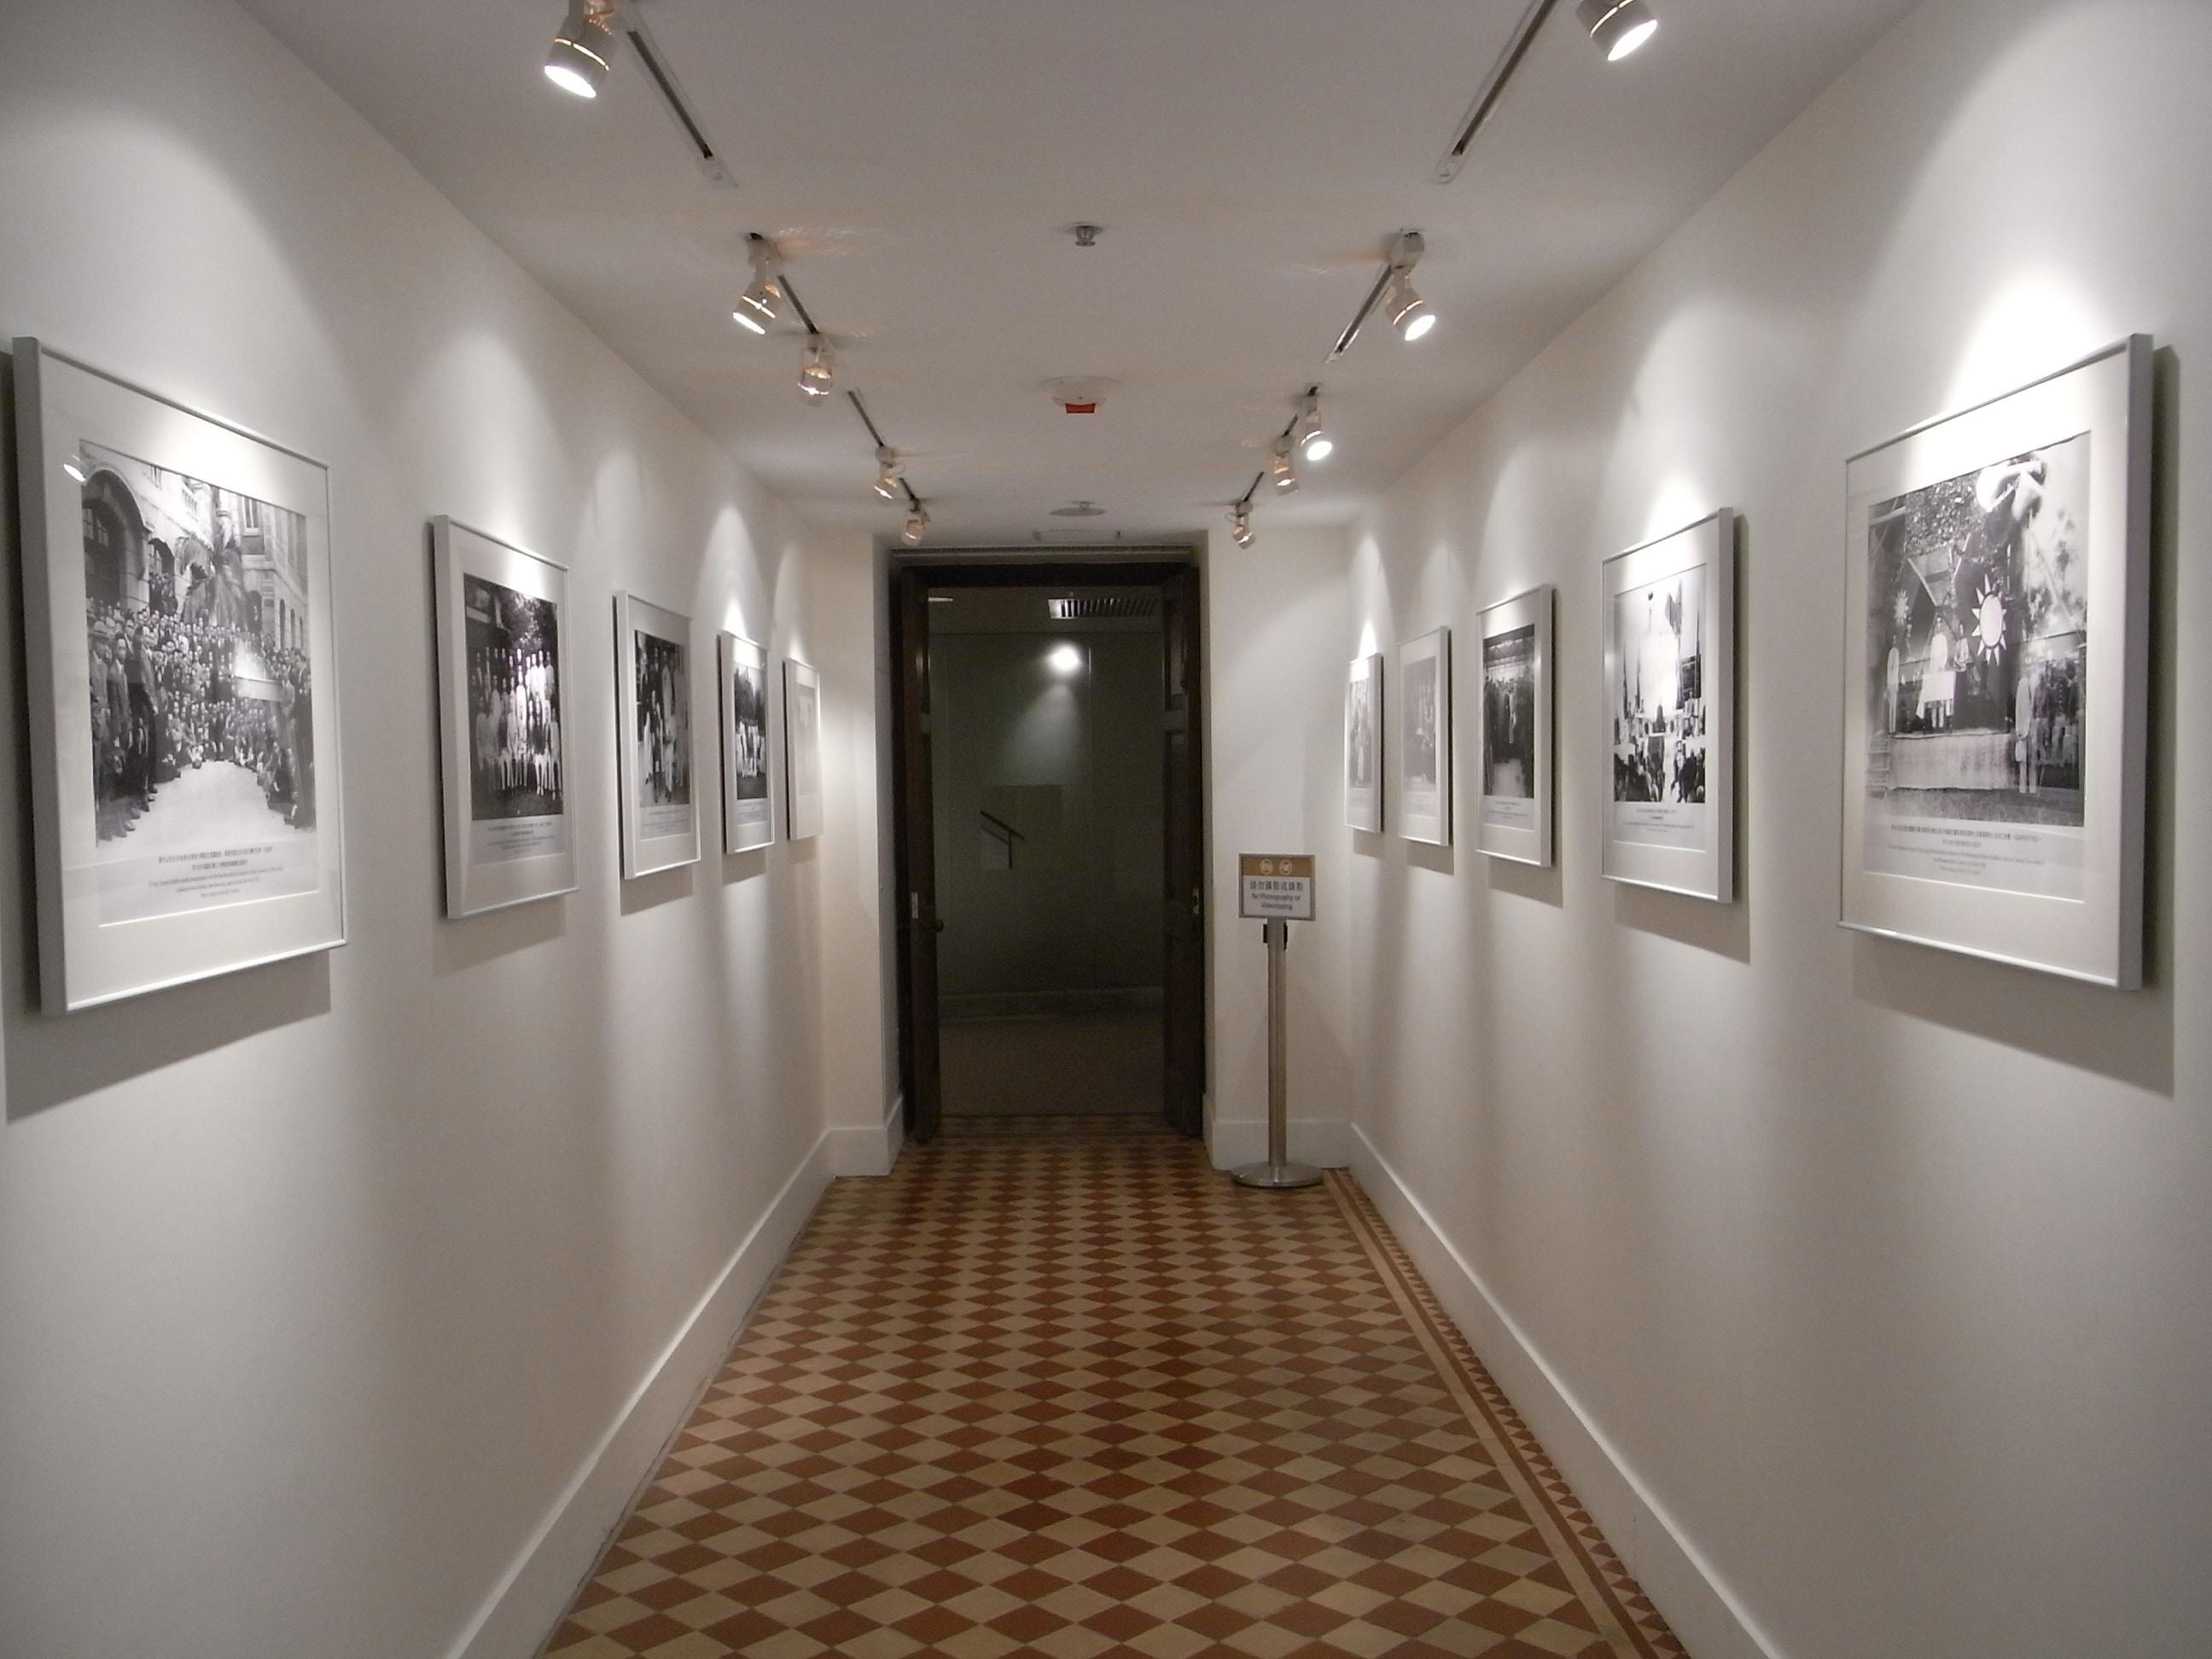 File hk mid levels kom tong hall sun yat sen museum interior corridor 01 jpg wikimedia commons - Corridor decoratie ...